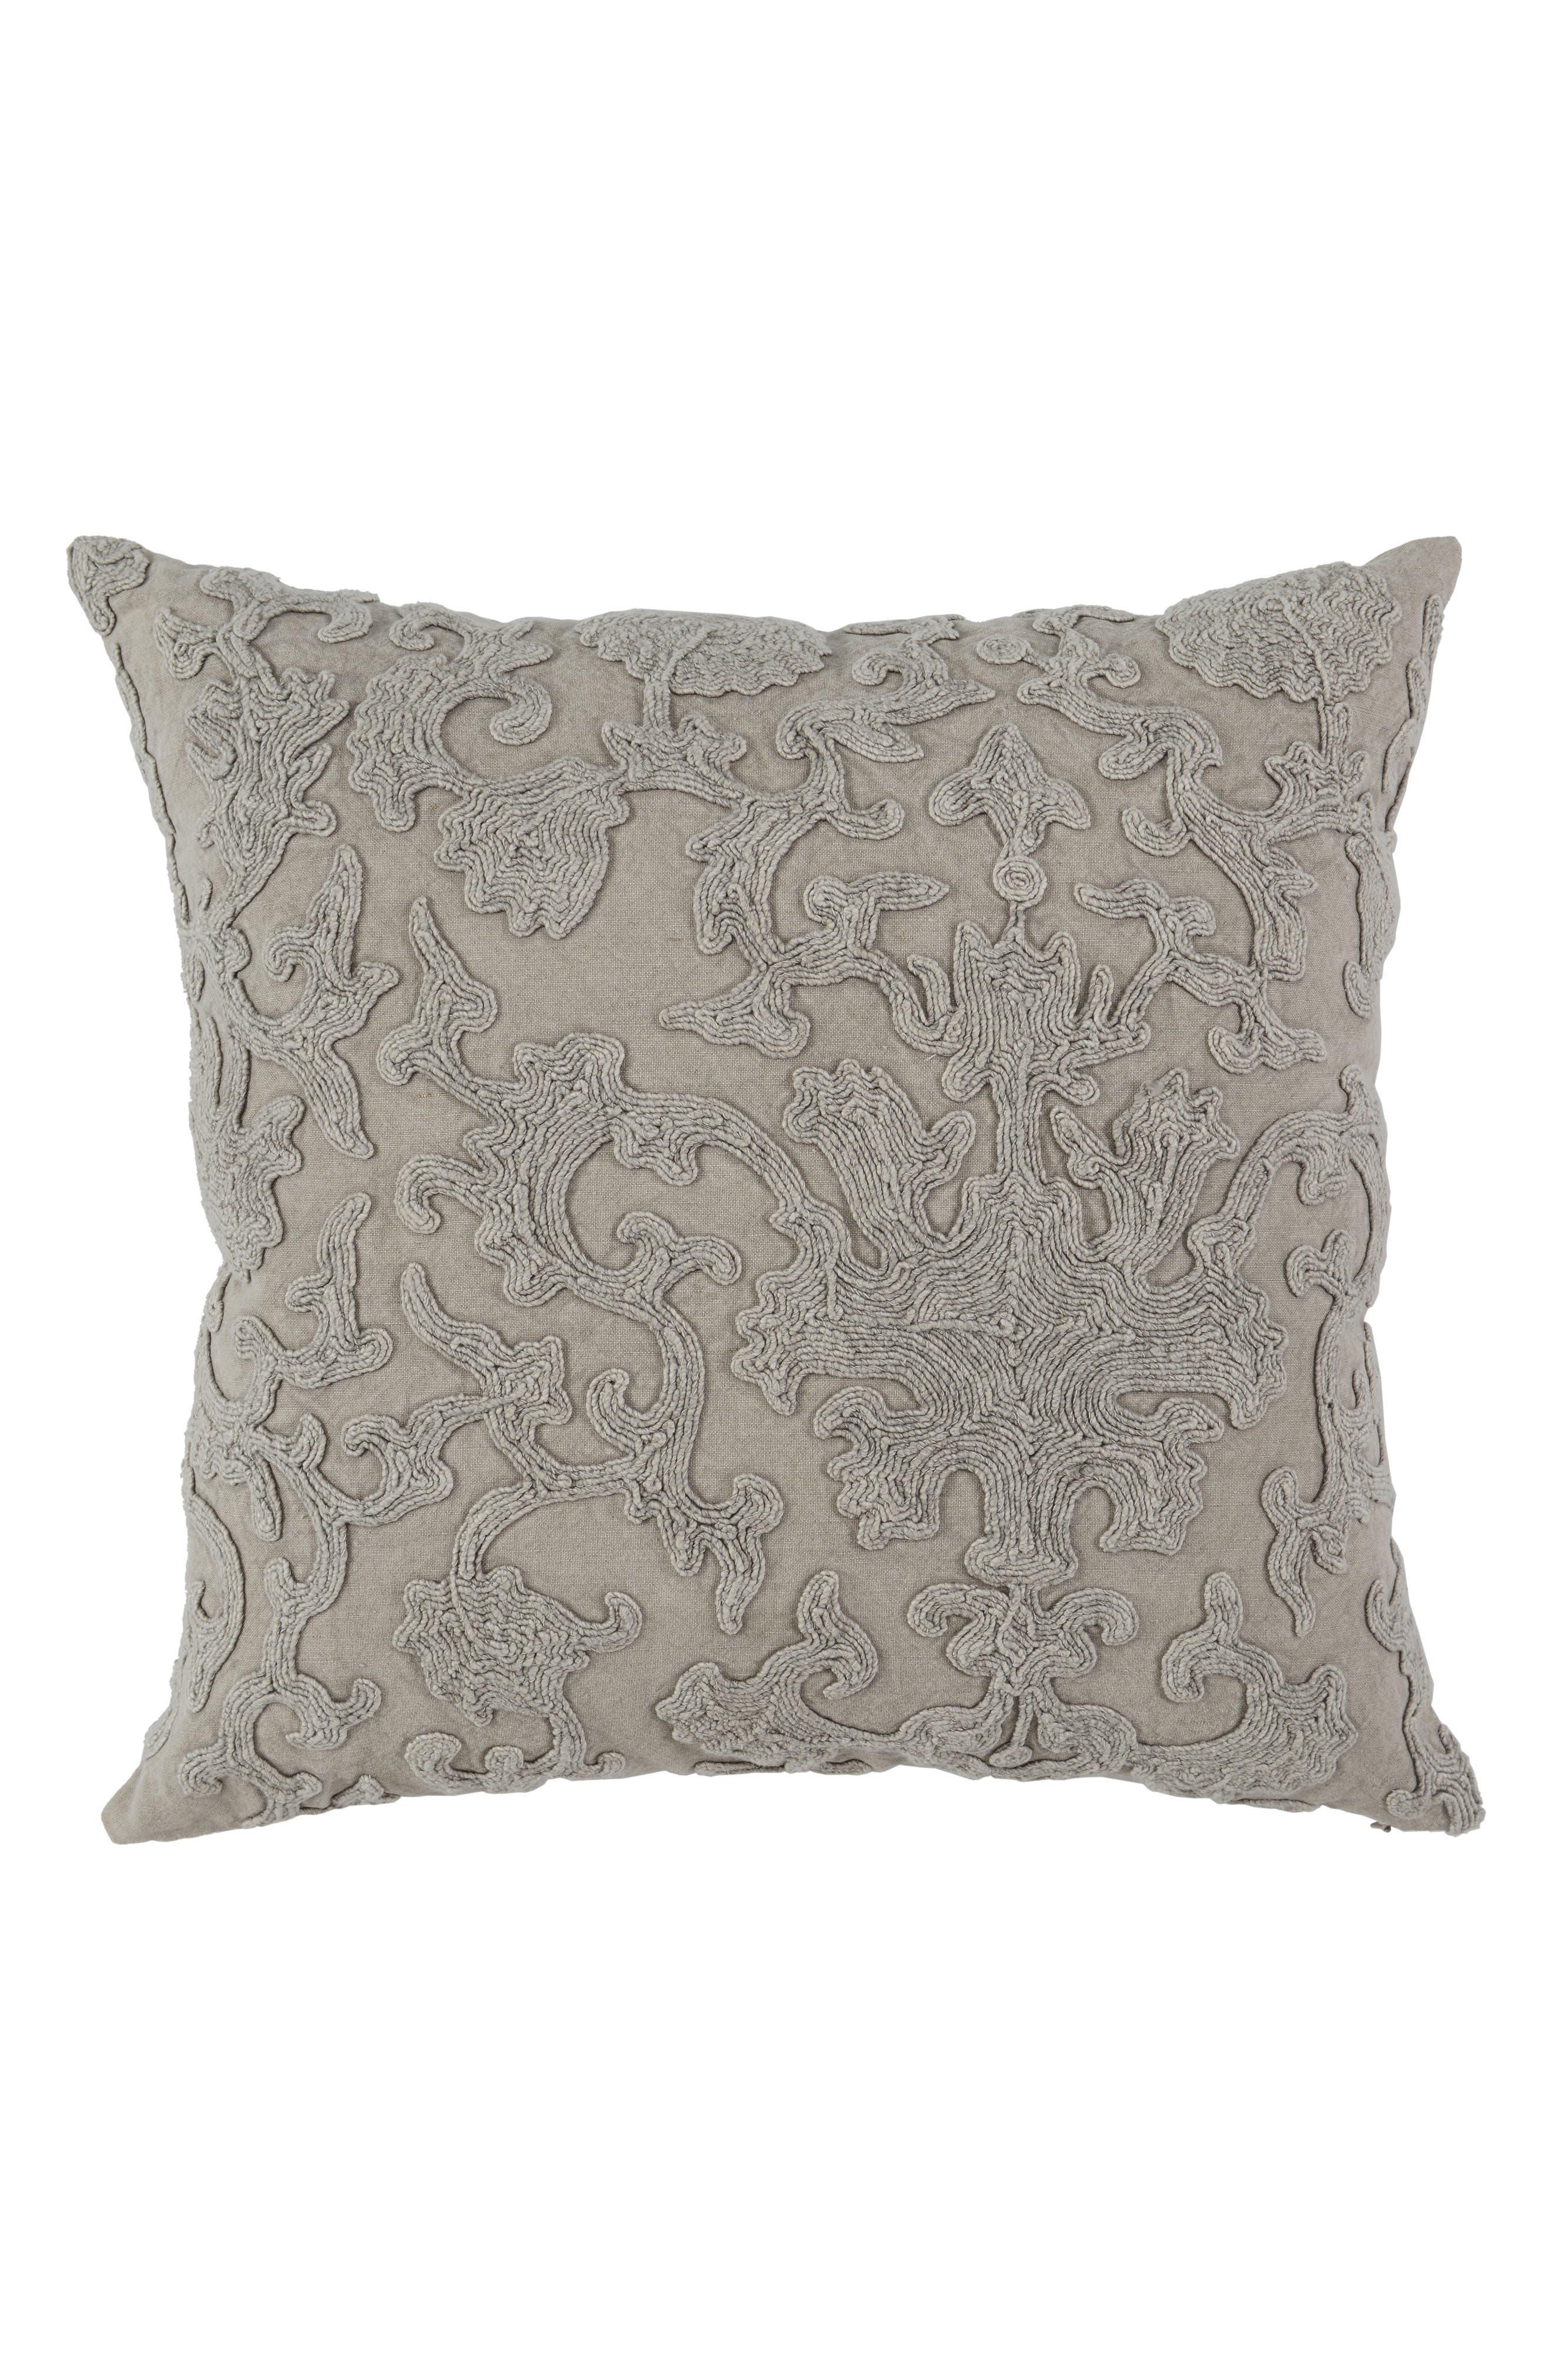 Portia Linen Accent Pillow,                             Main thumbnail 1, color,                             NATURAL